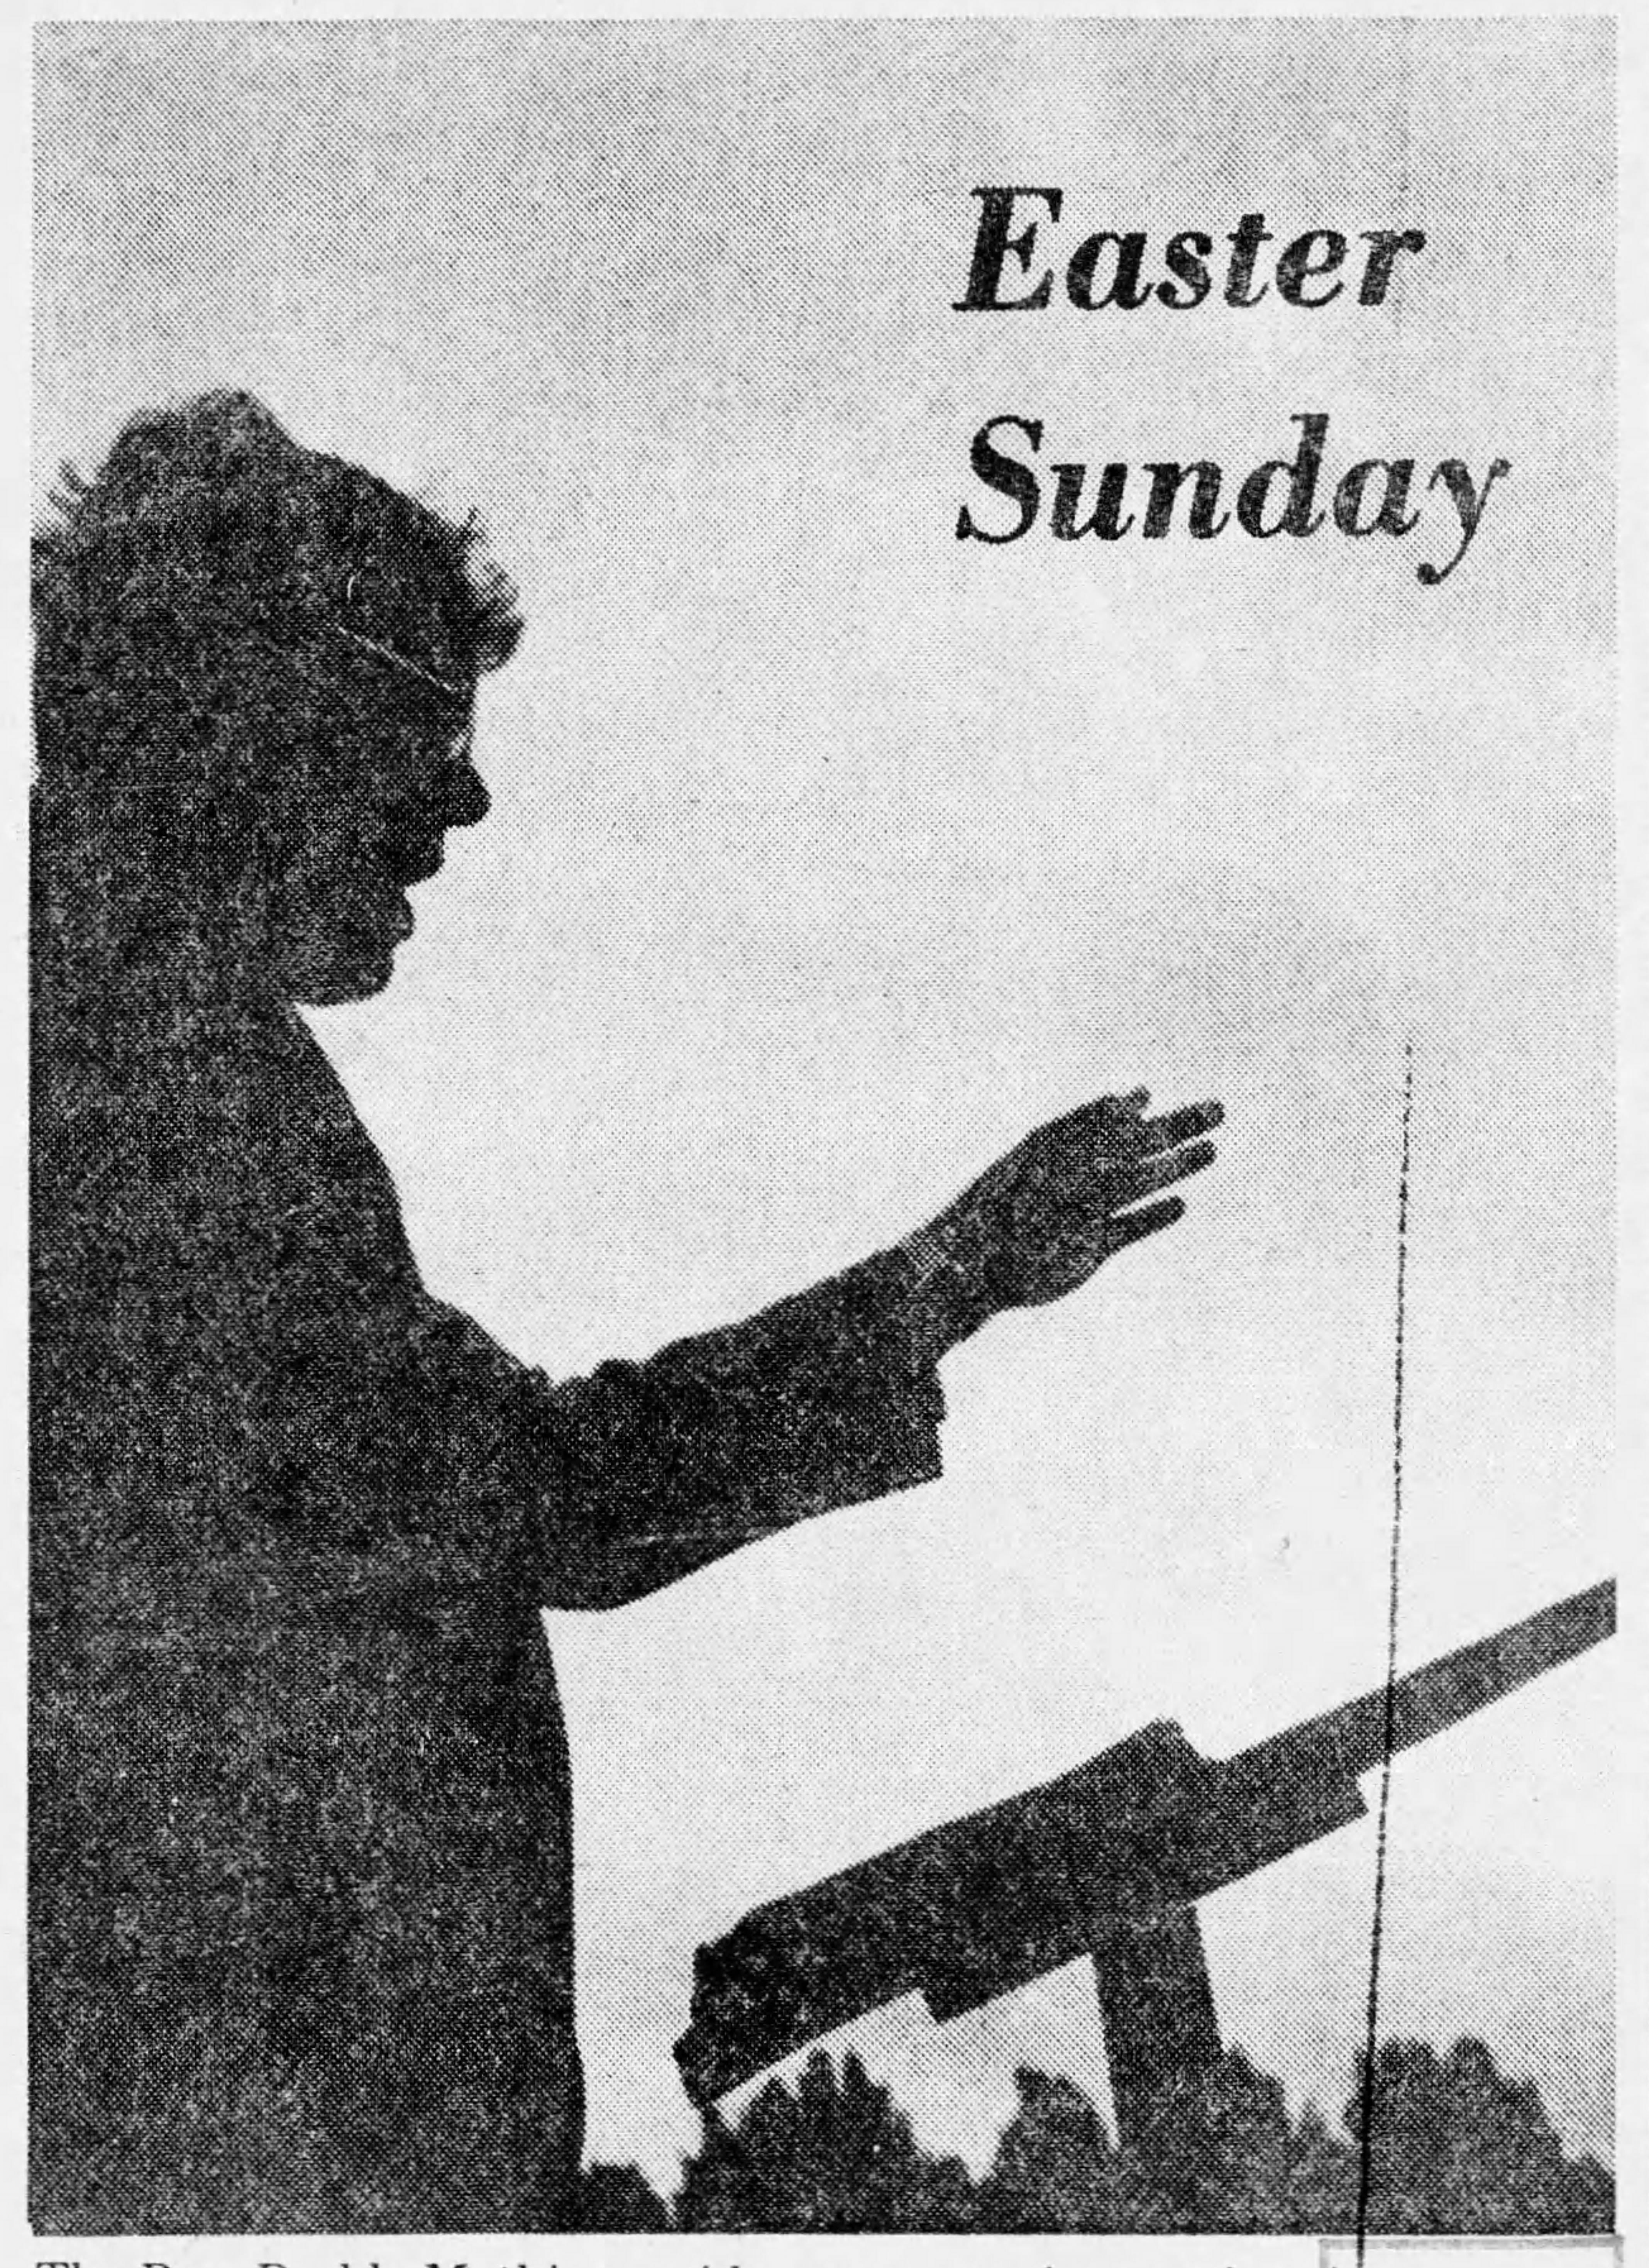 Article: Bridge Transformed into Sunrise Church (1978)